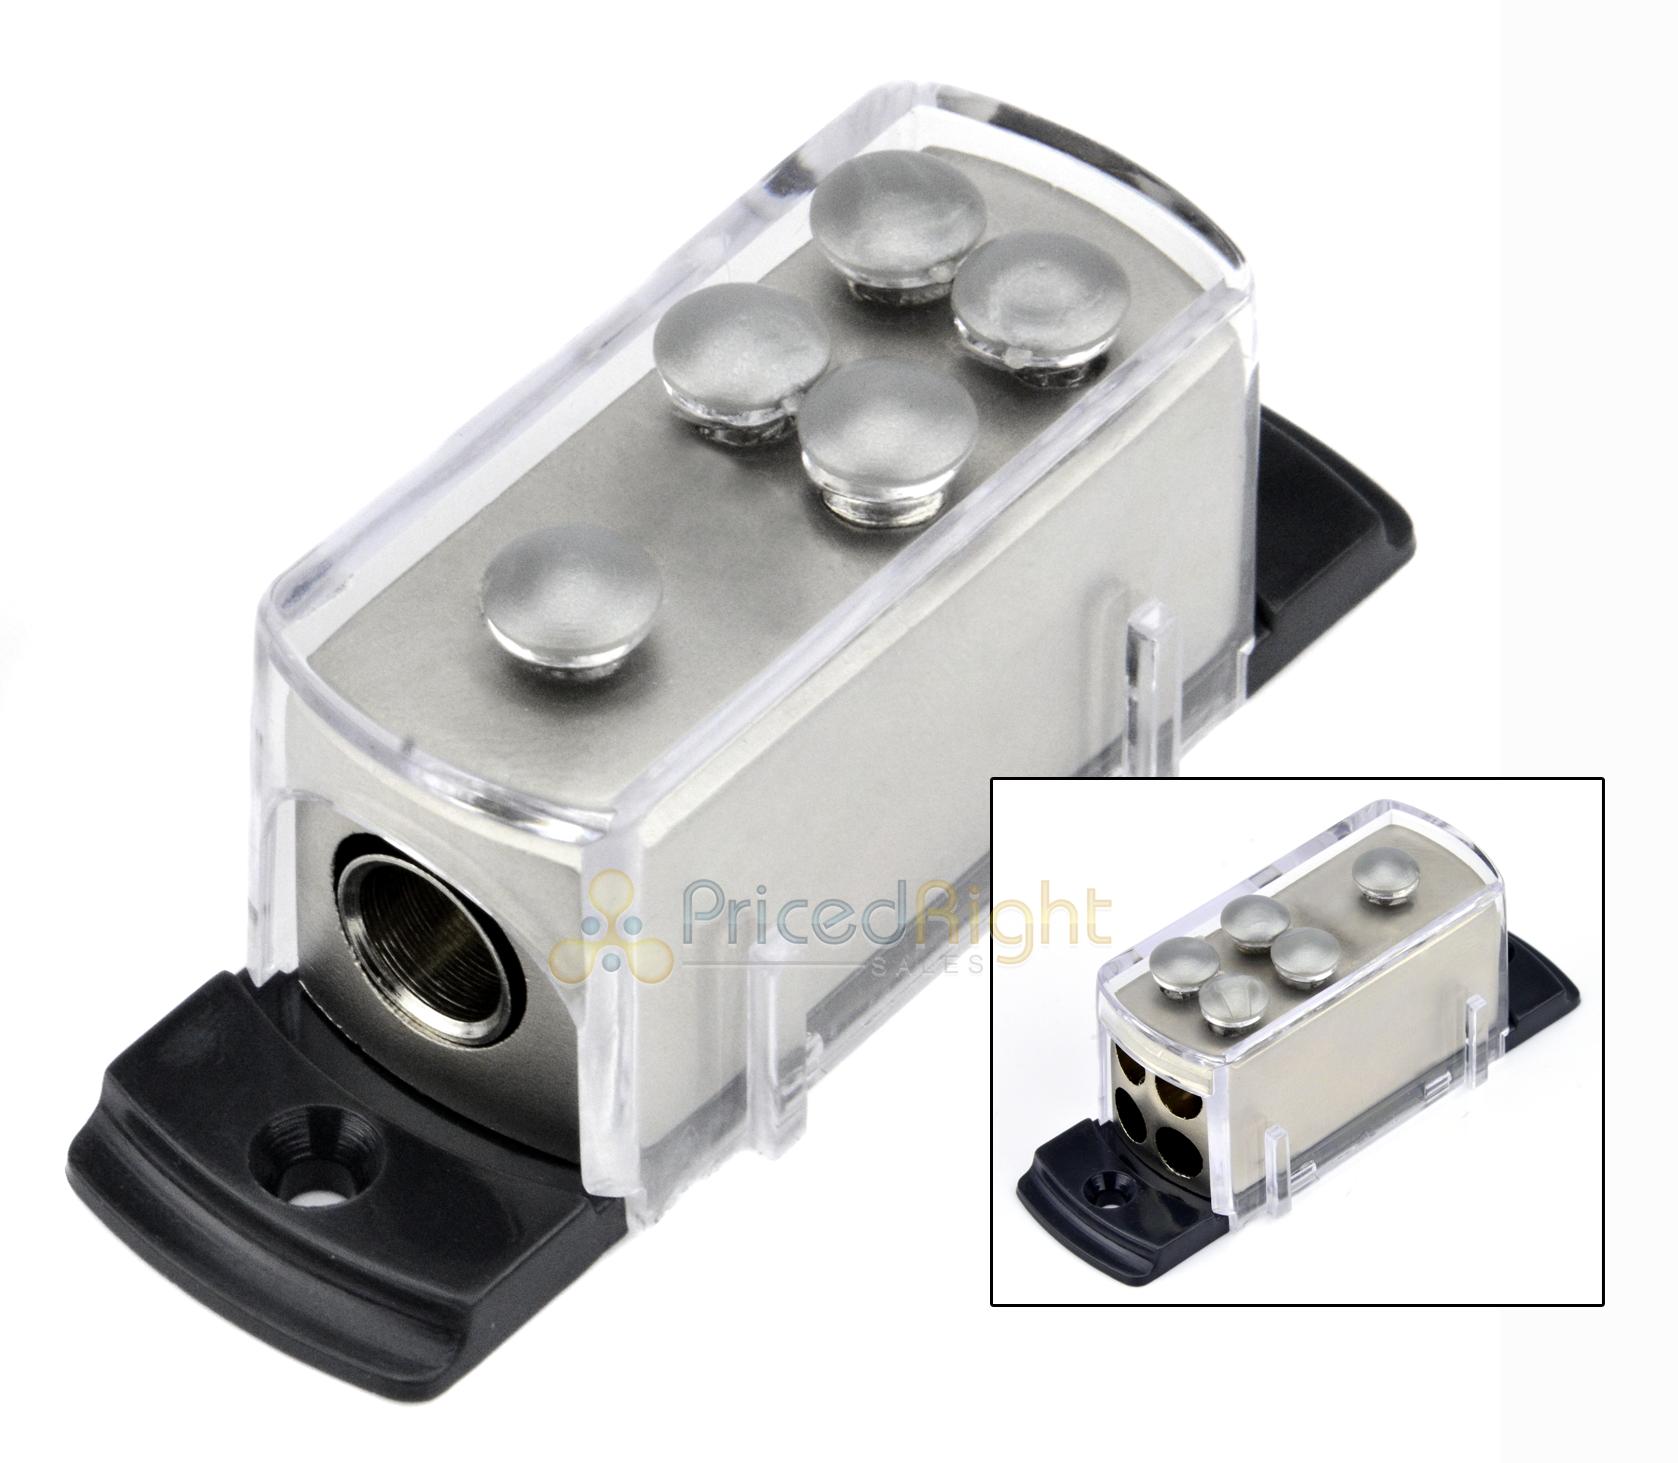 4 8 gauge power platinum distribution block car audio wiring 1 to 4 Car Audio Capacitor Wiring 4 8 gauge power platinum distribution block car audio wiring 1 to 4 amp